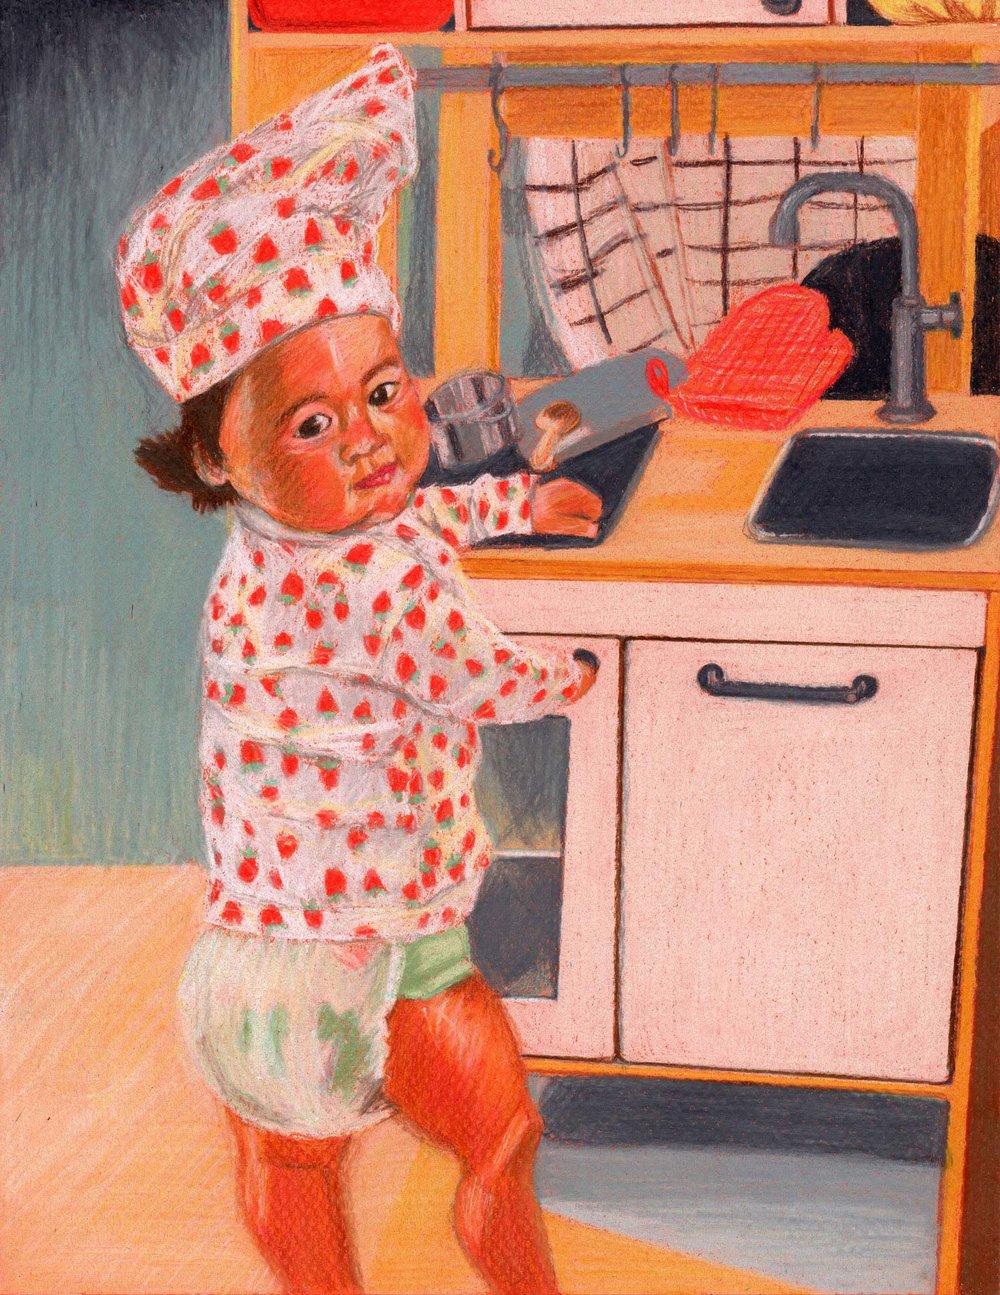 Baby Chef